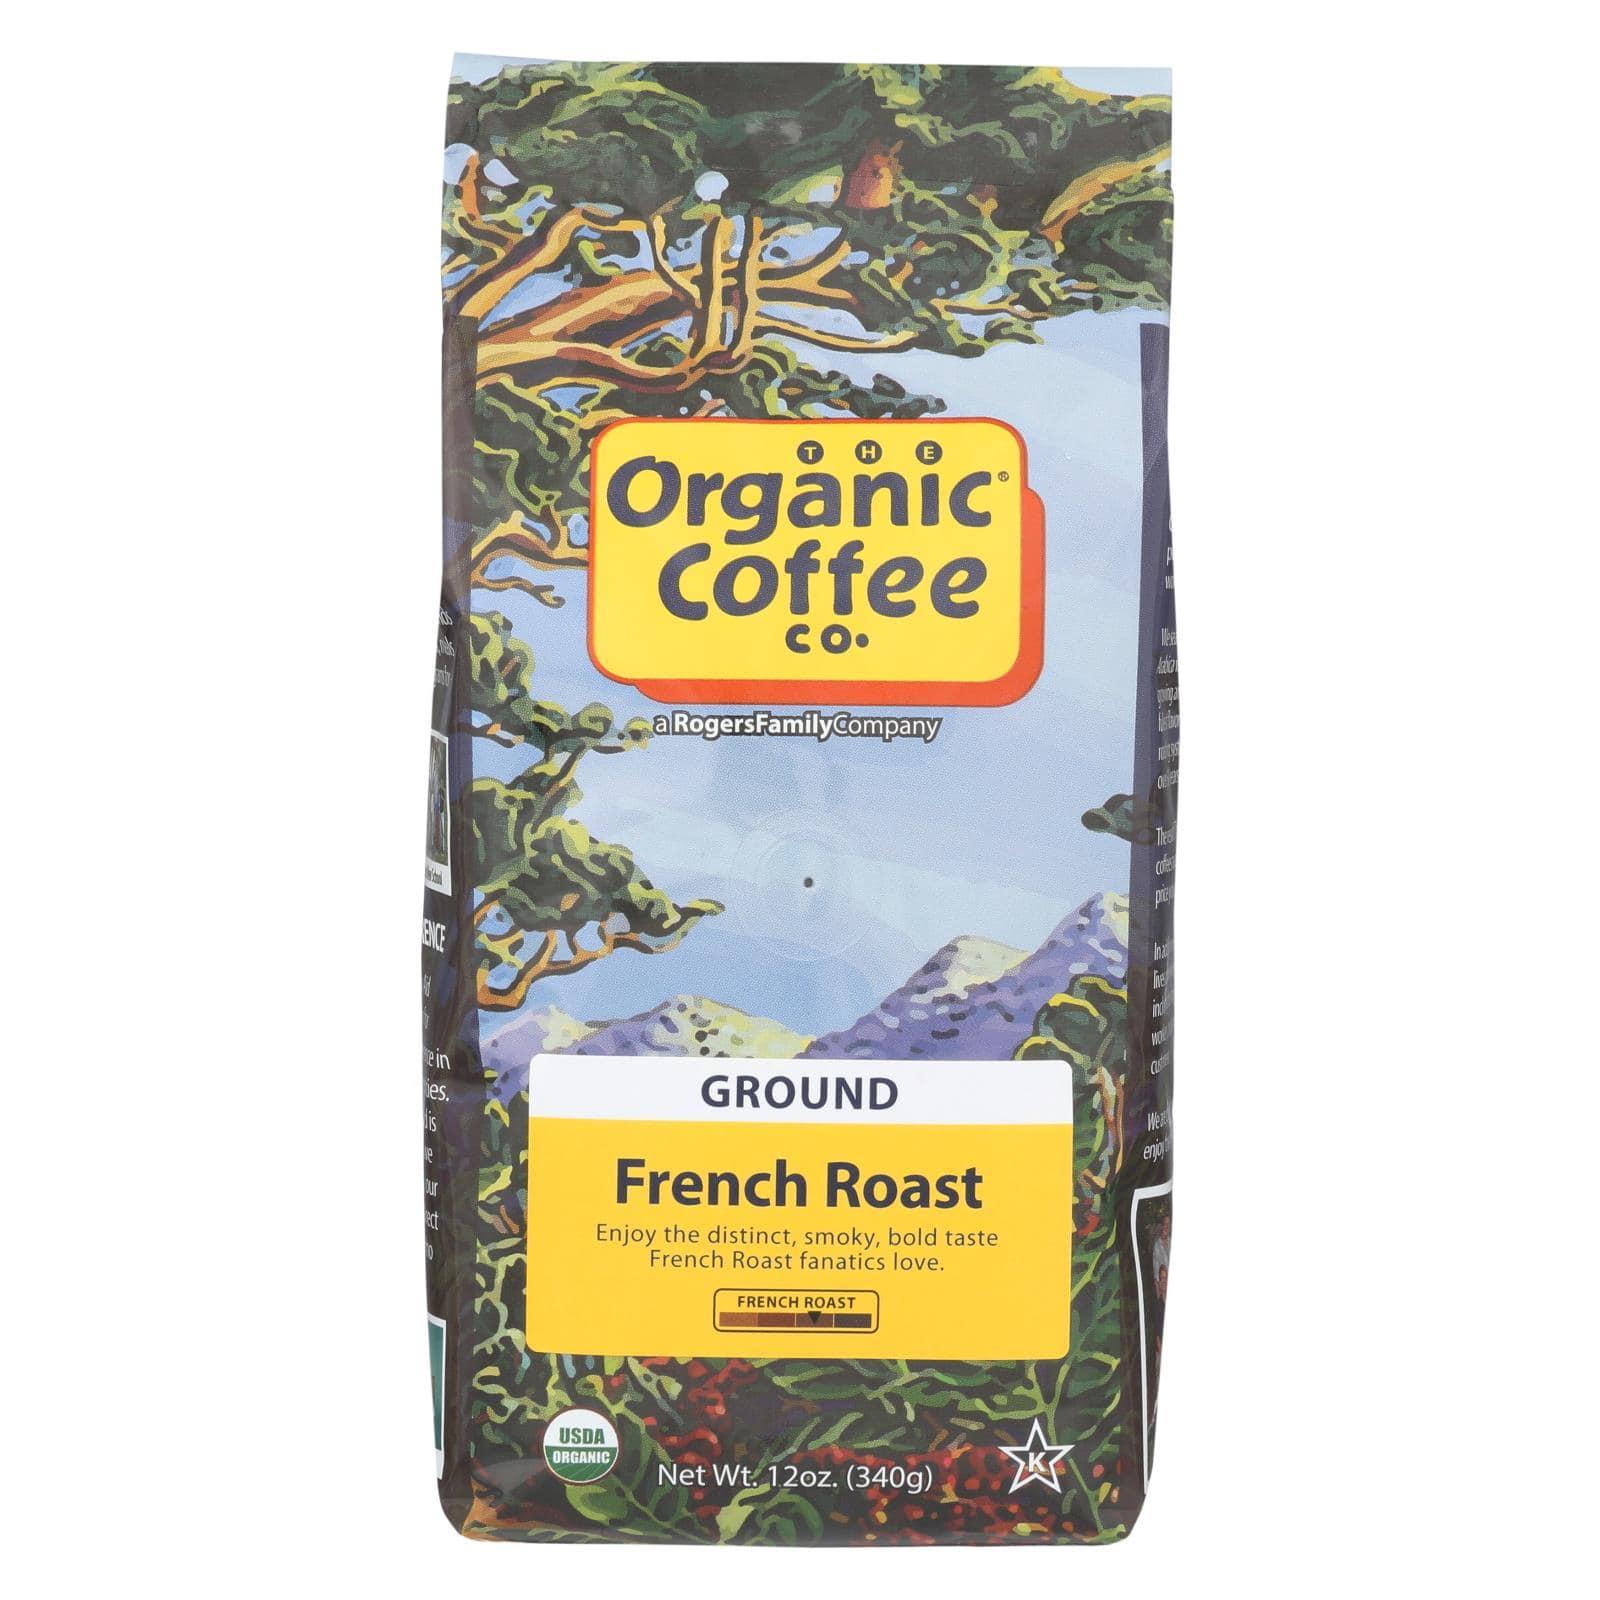 The Organic Coffee Co. Ground Coffee